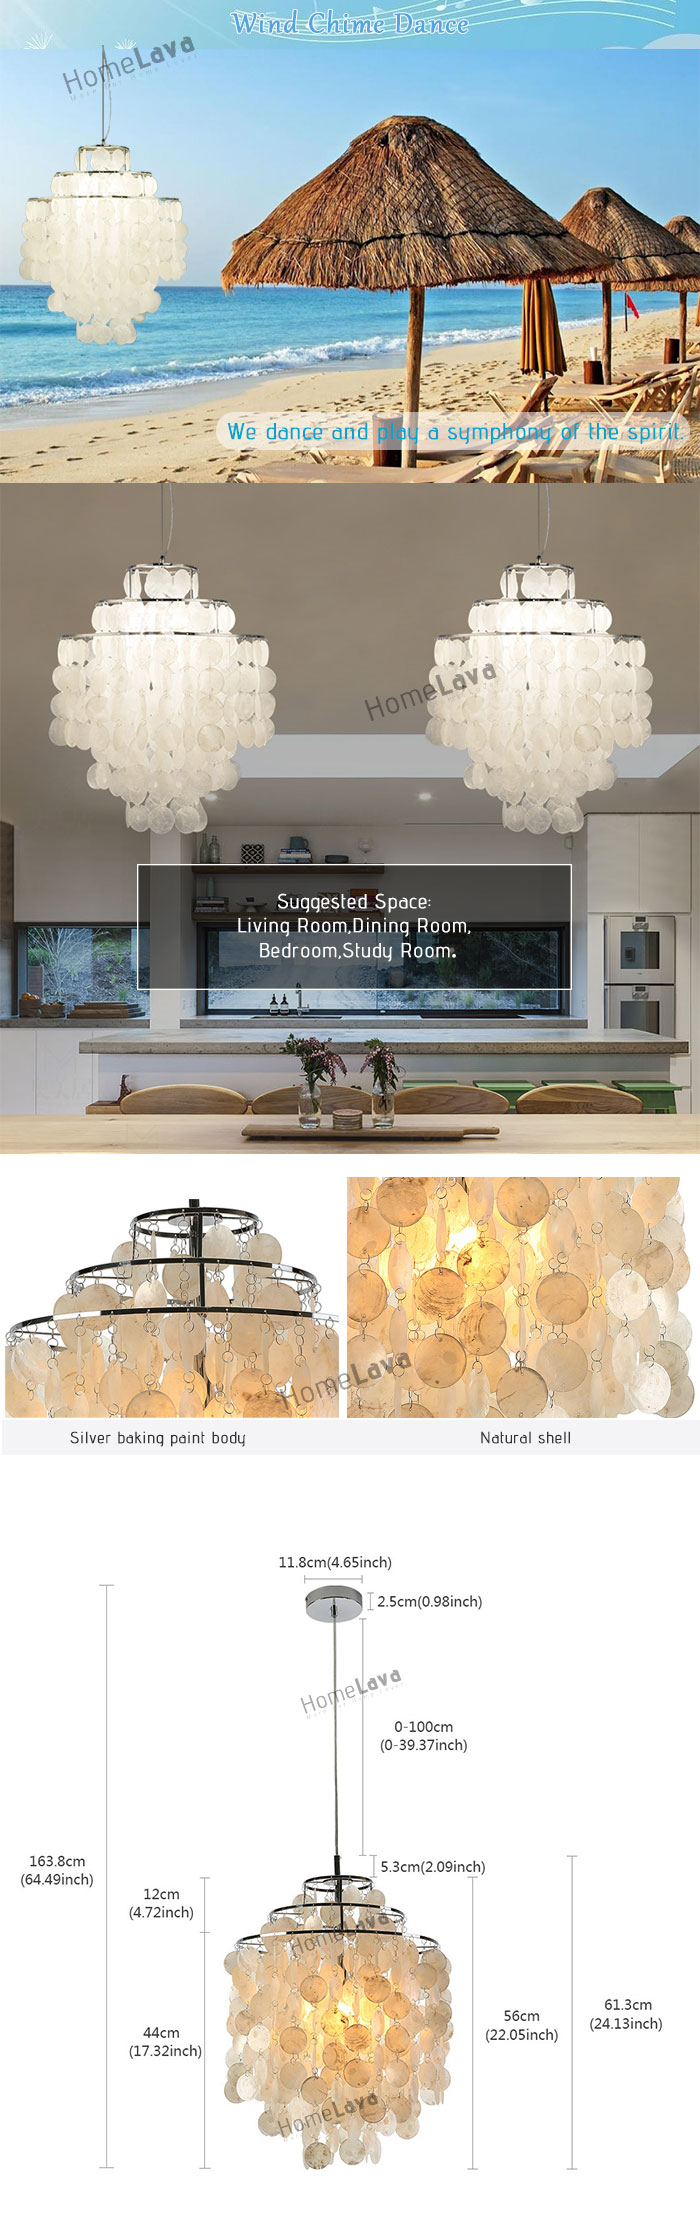 Ceiling Lights Modern Chandelier White Shell Pendant Lights Lamp with 1 Light(Wind Chime Dance)